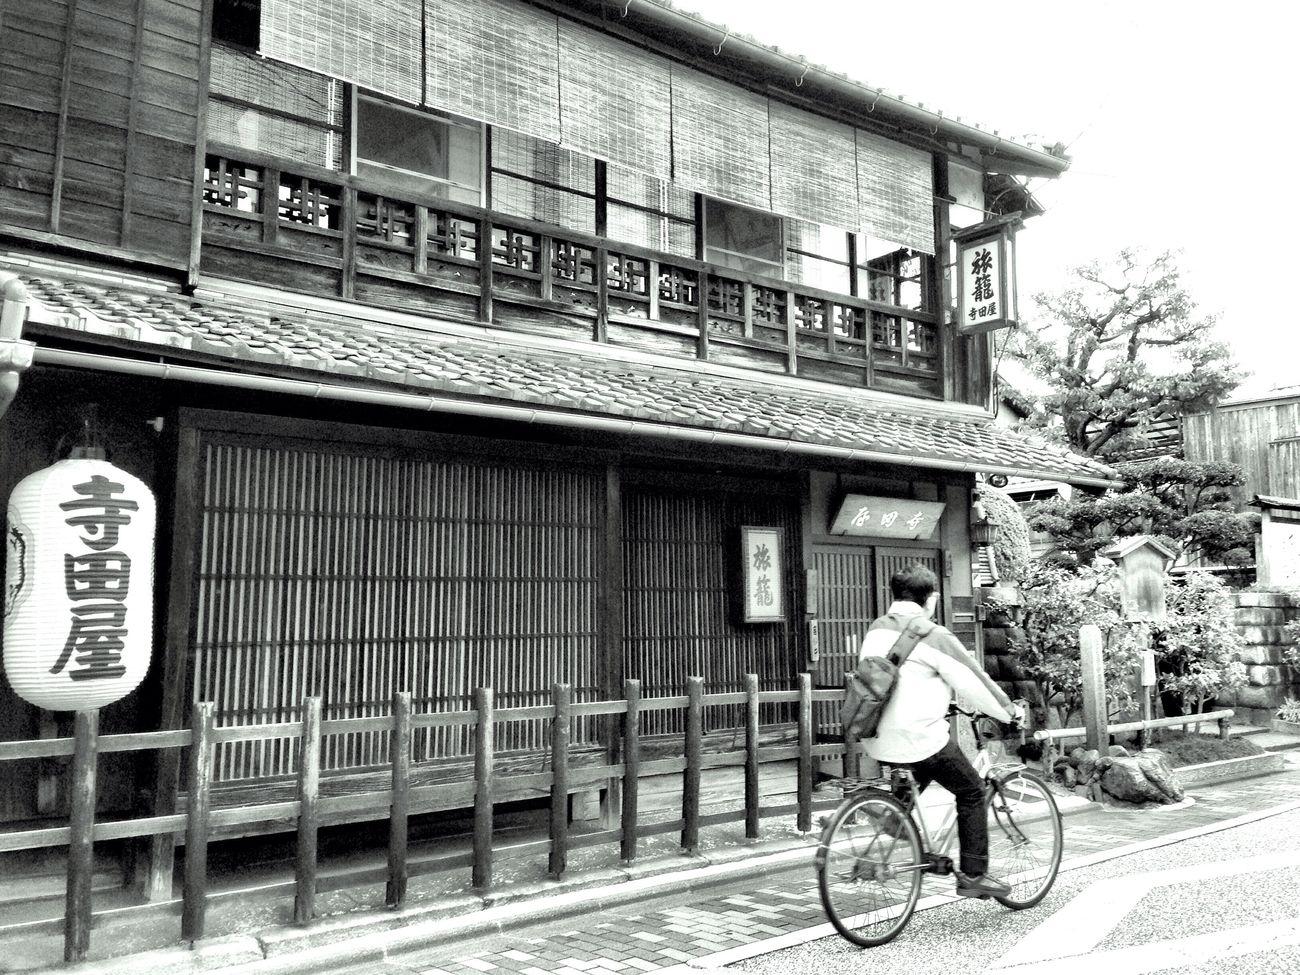 Terada-ya Port-inn Sakamoto Ryoma 寺田屋 モノクロ Kyoto, Japan One Person